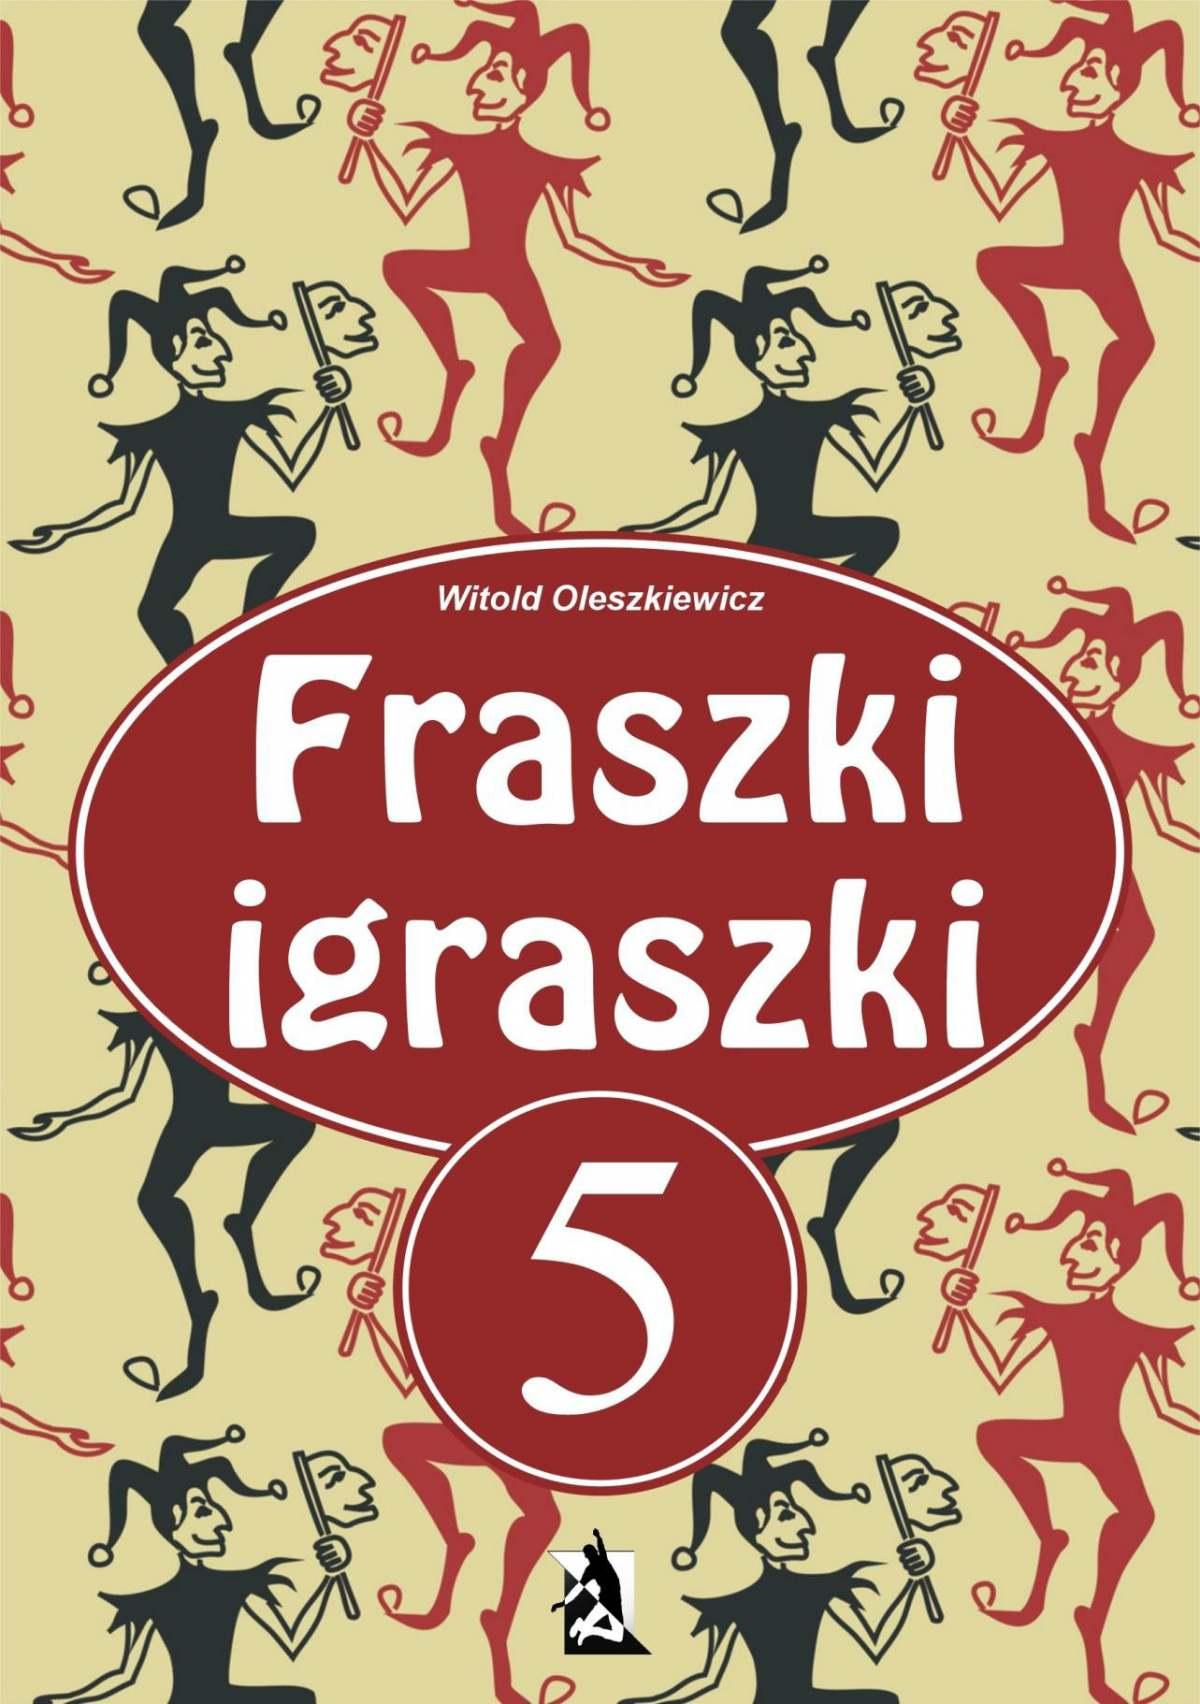 Fraszki igraszki V - Ebook (Książka EPUB) do pobrania w formacie EPUB